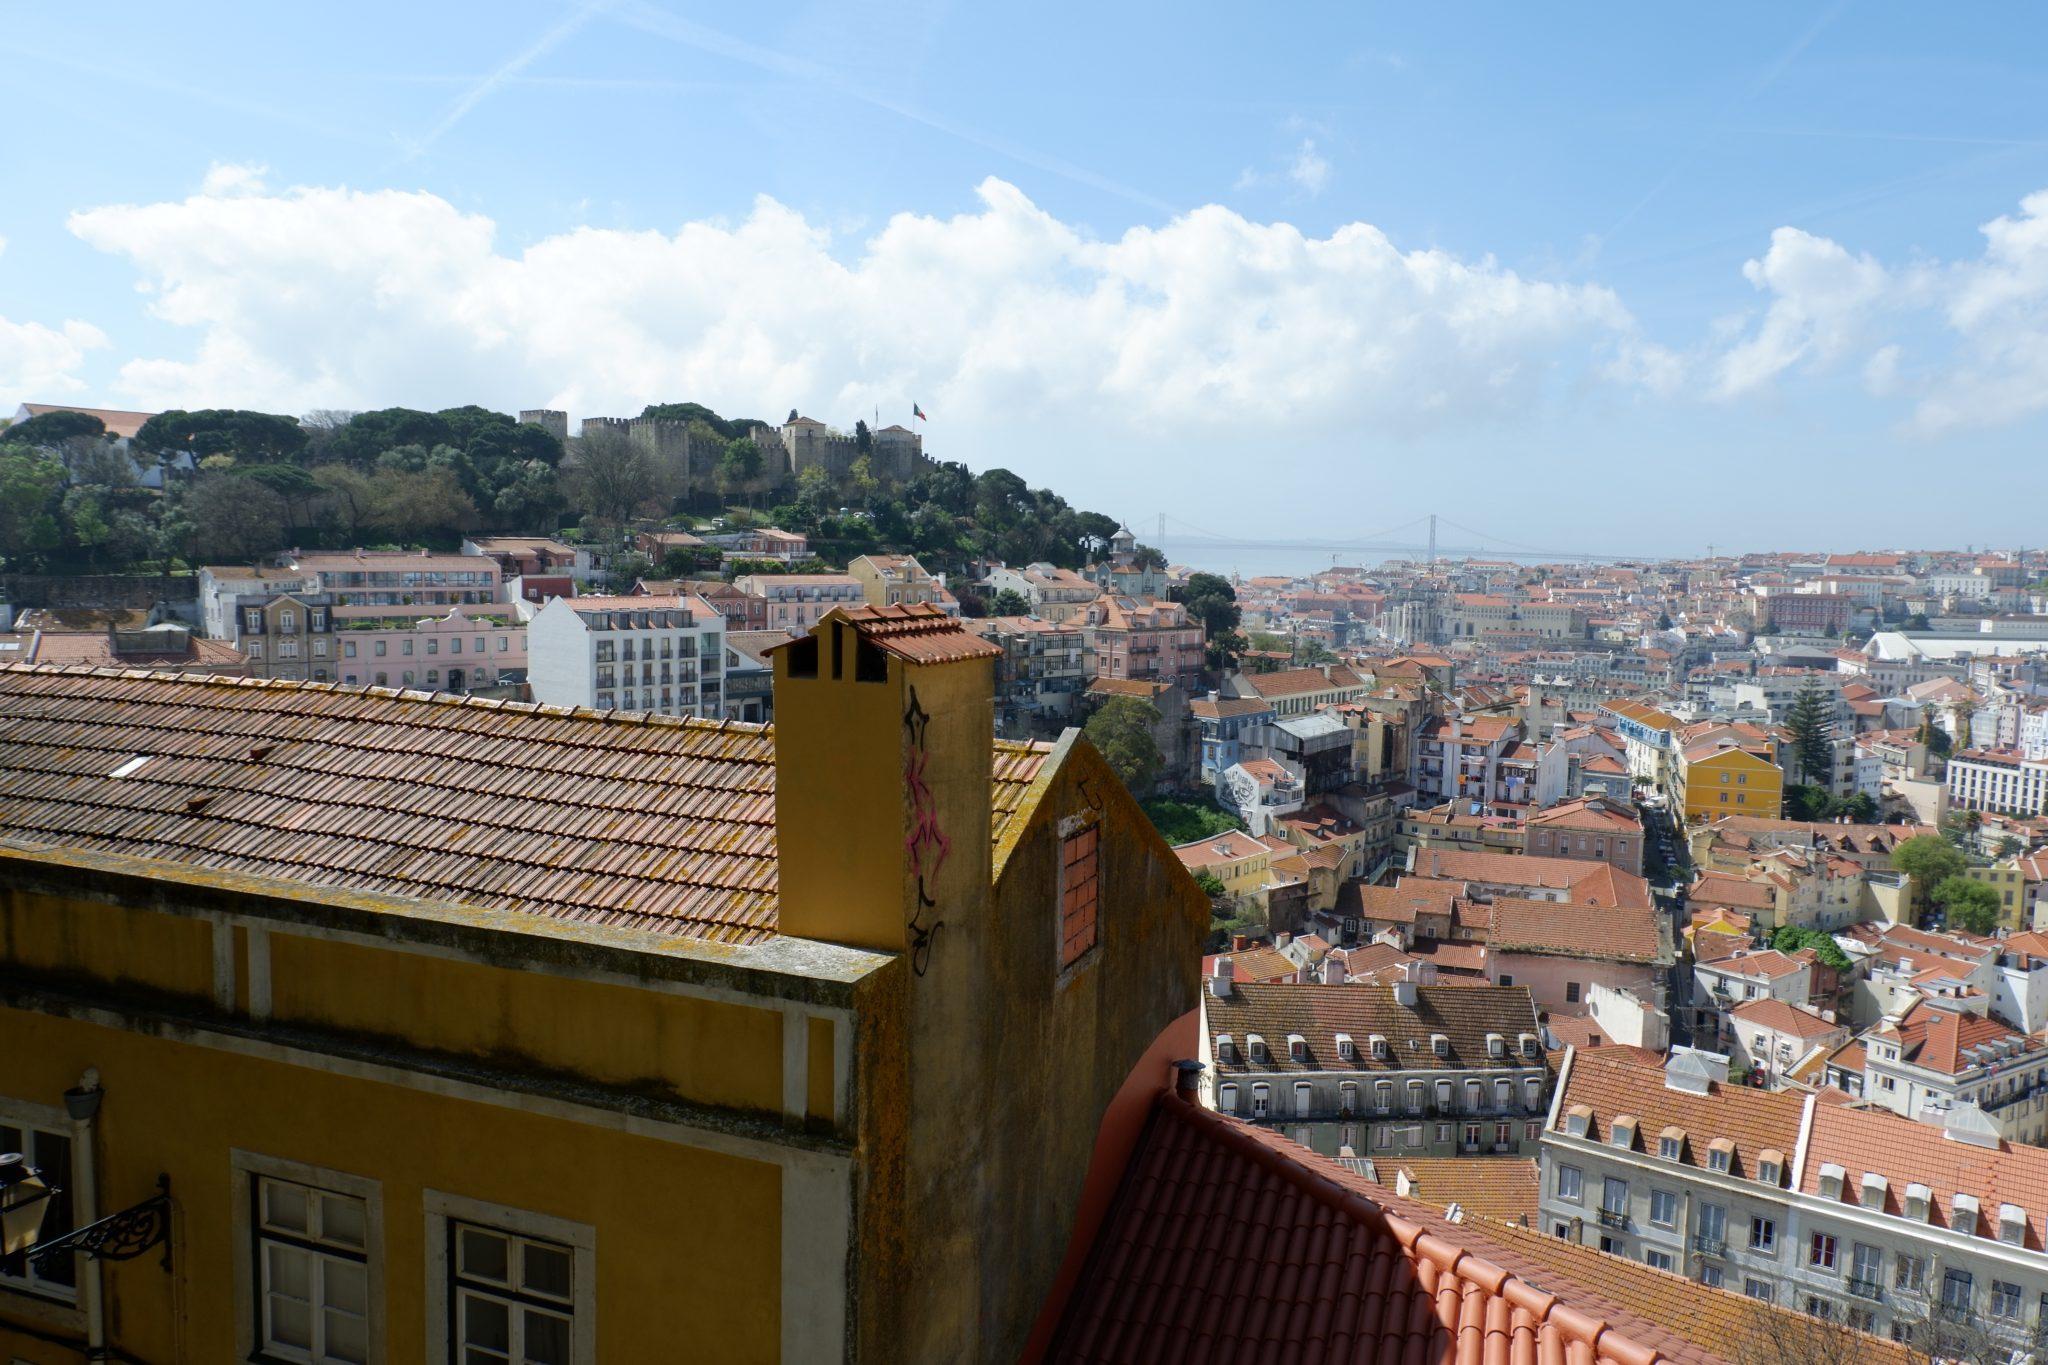 Miradouro da Graça, Terrace with great views of the city